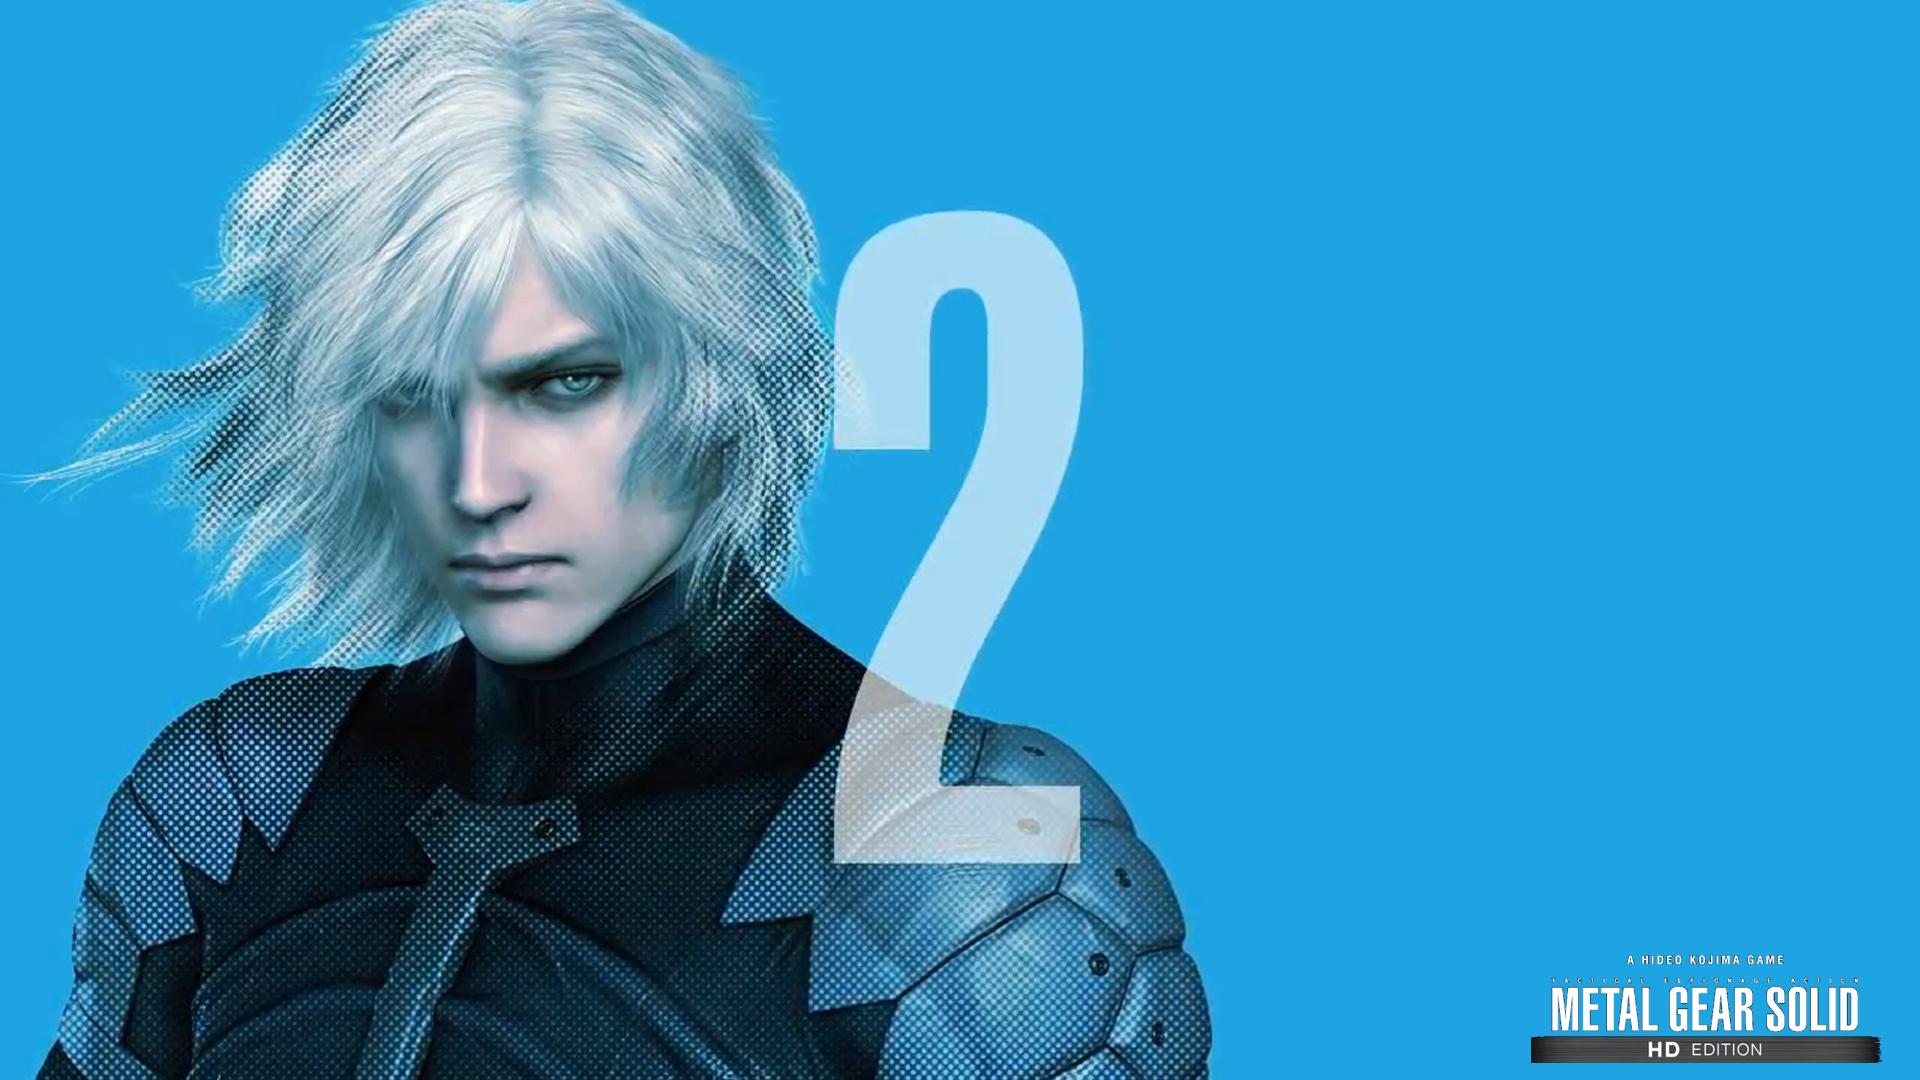 Raiden Mgs2 Hd Metal Gear Solid 2: So...